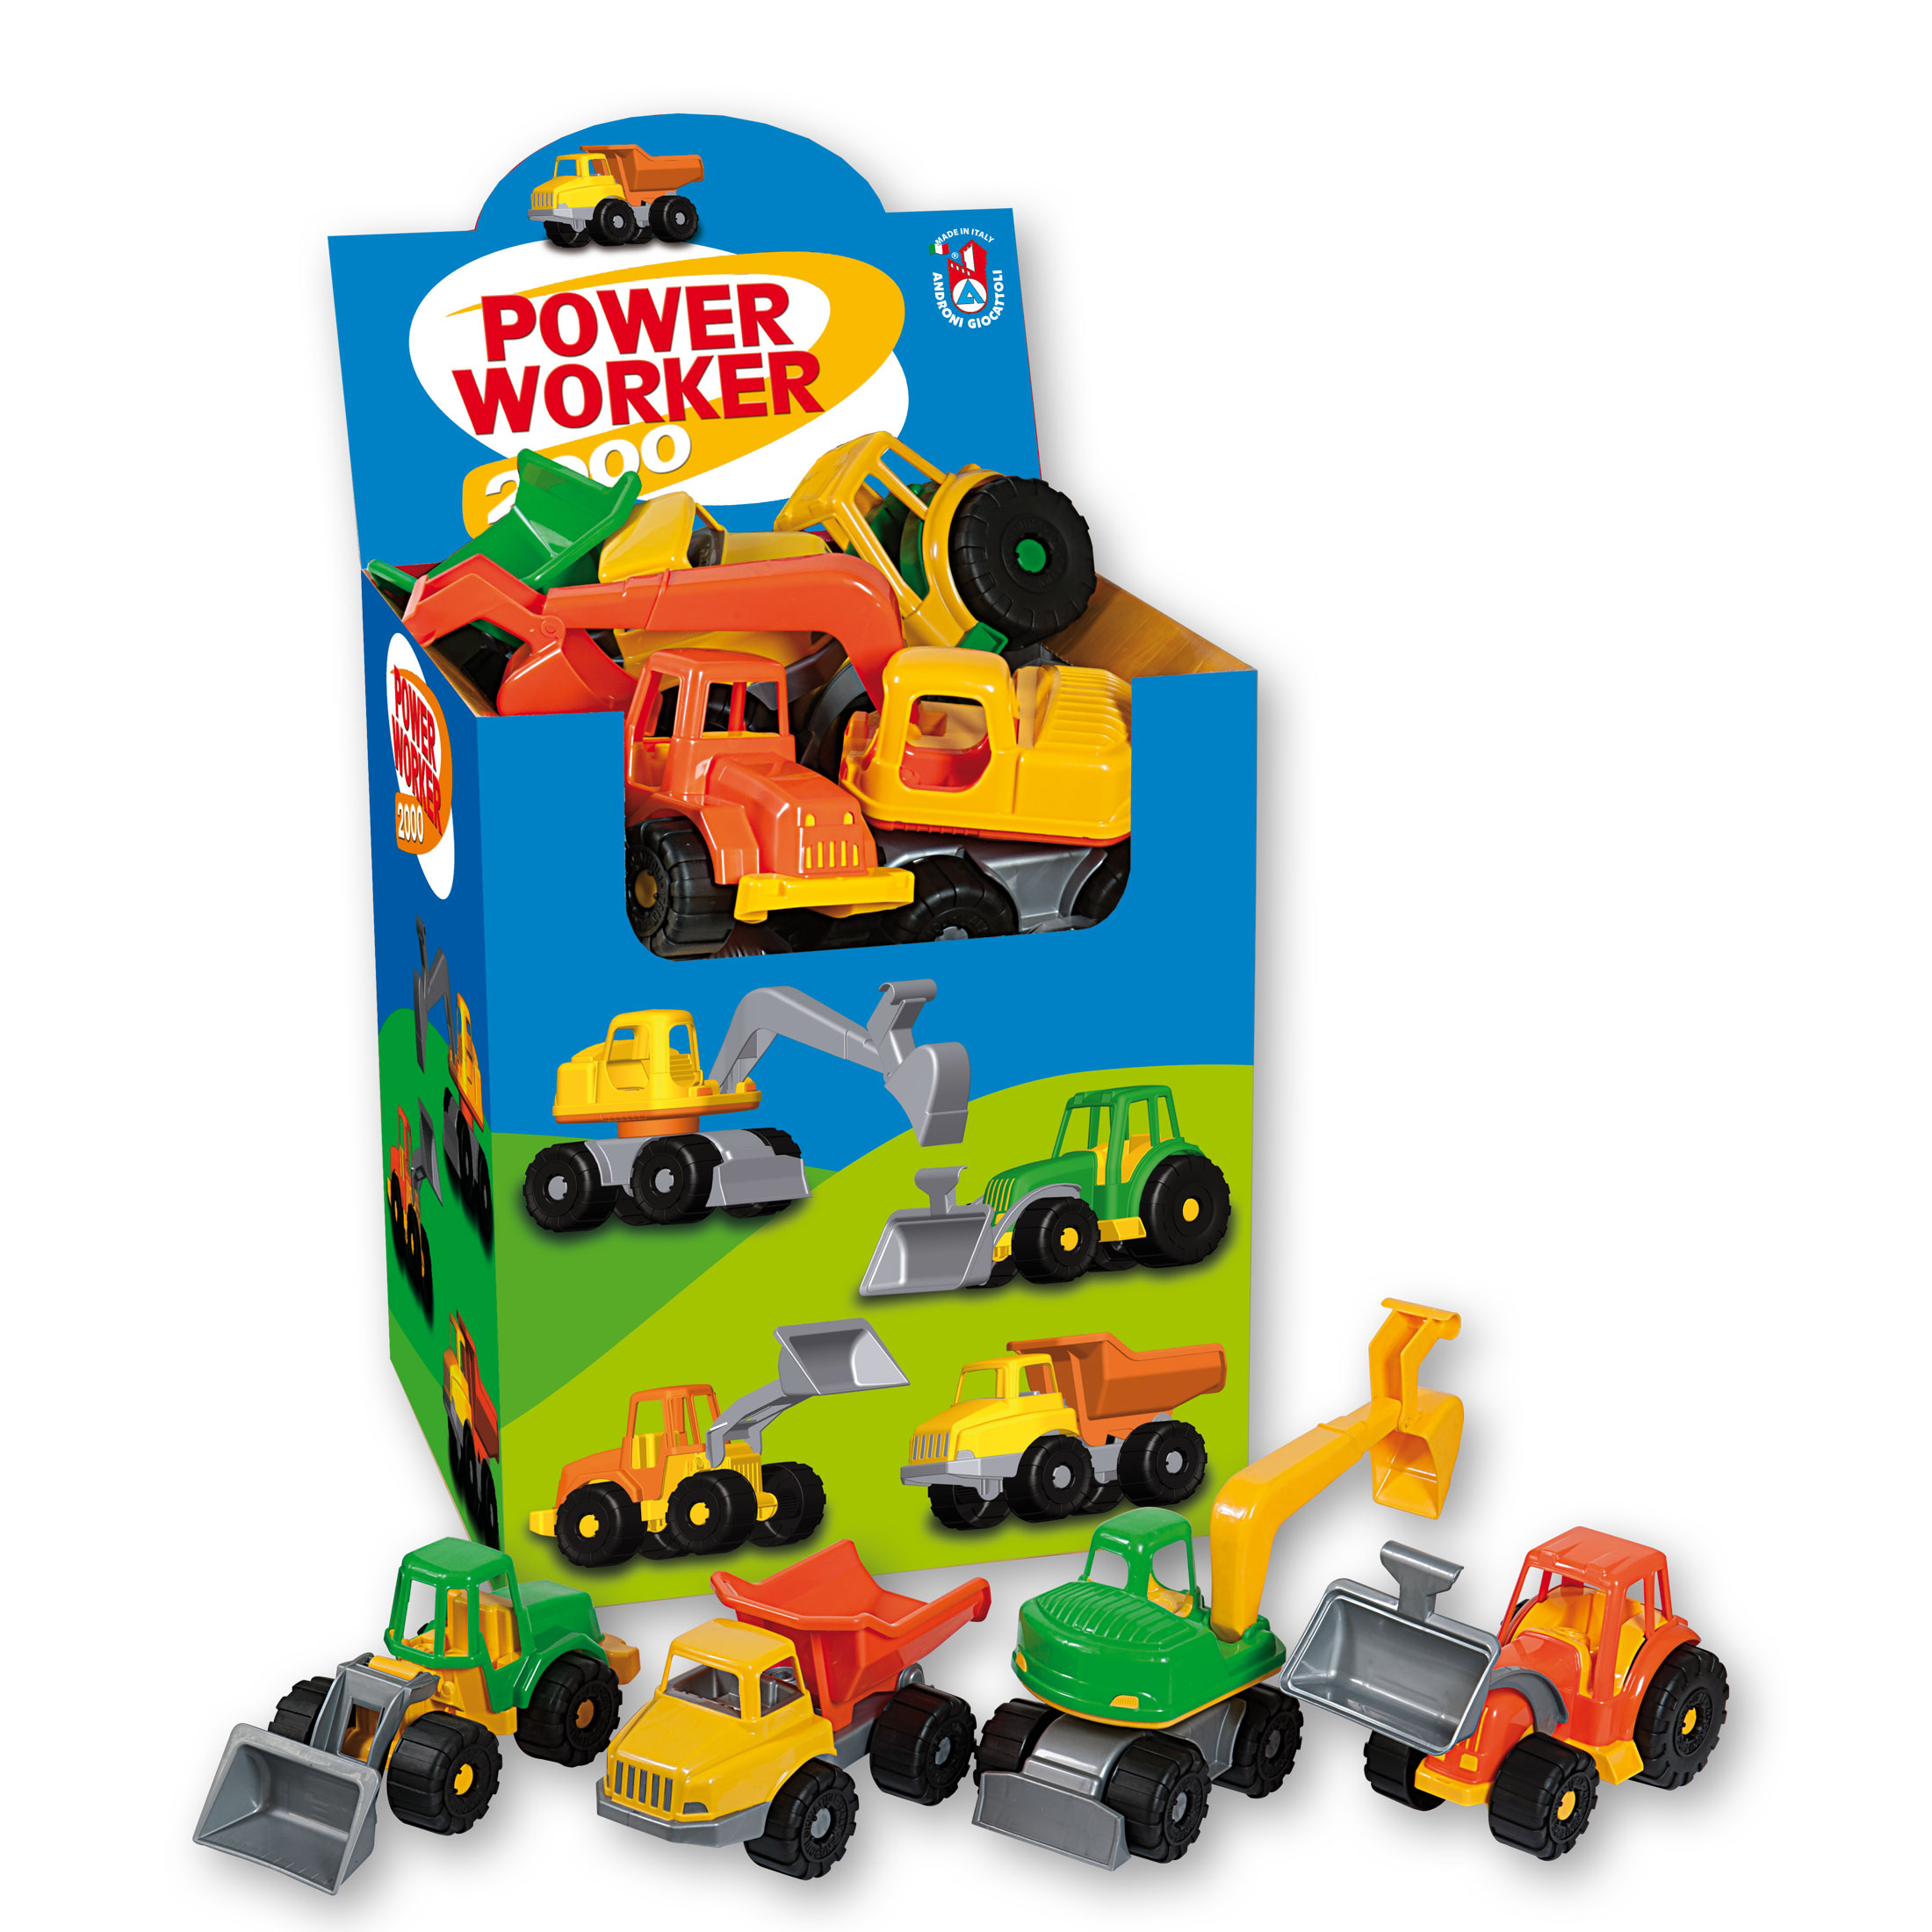 Androni Pracovní stroje Power Worker - displej